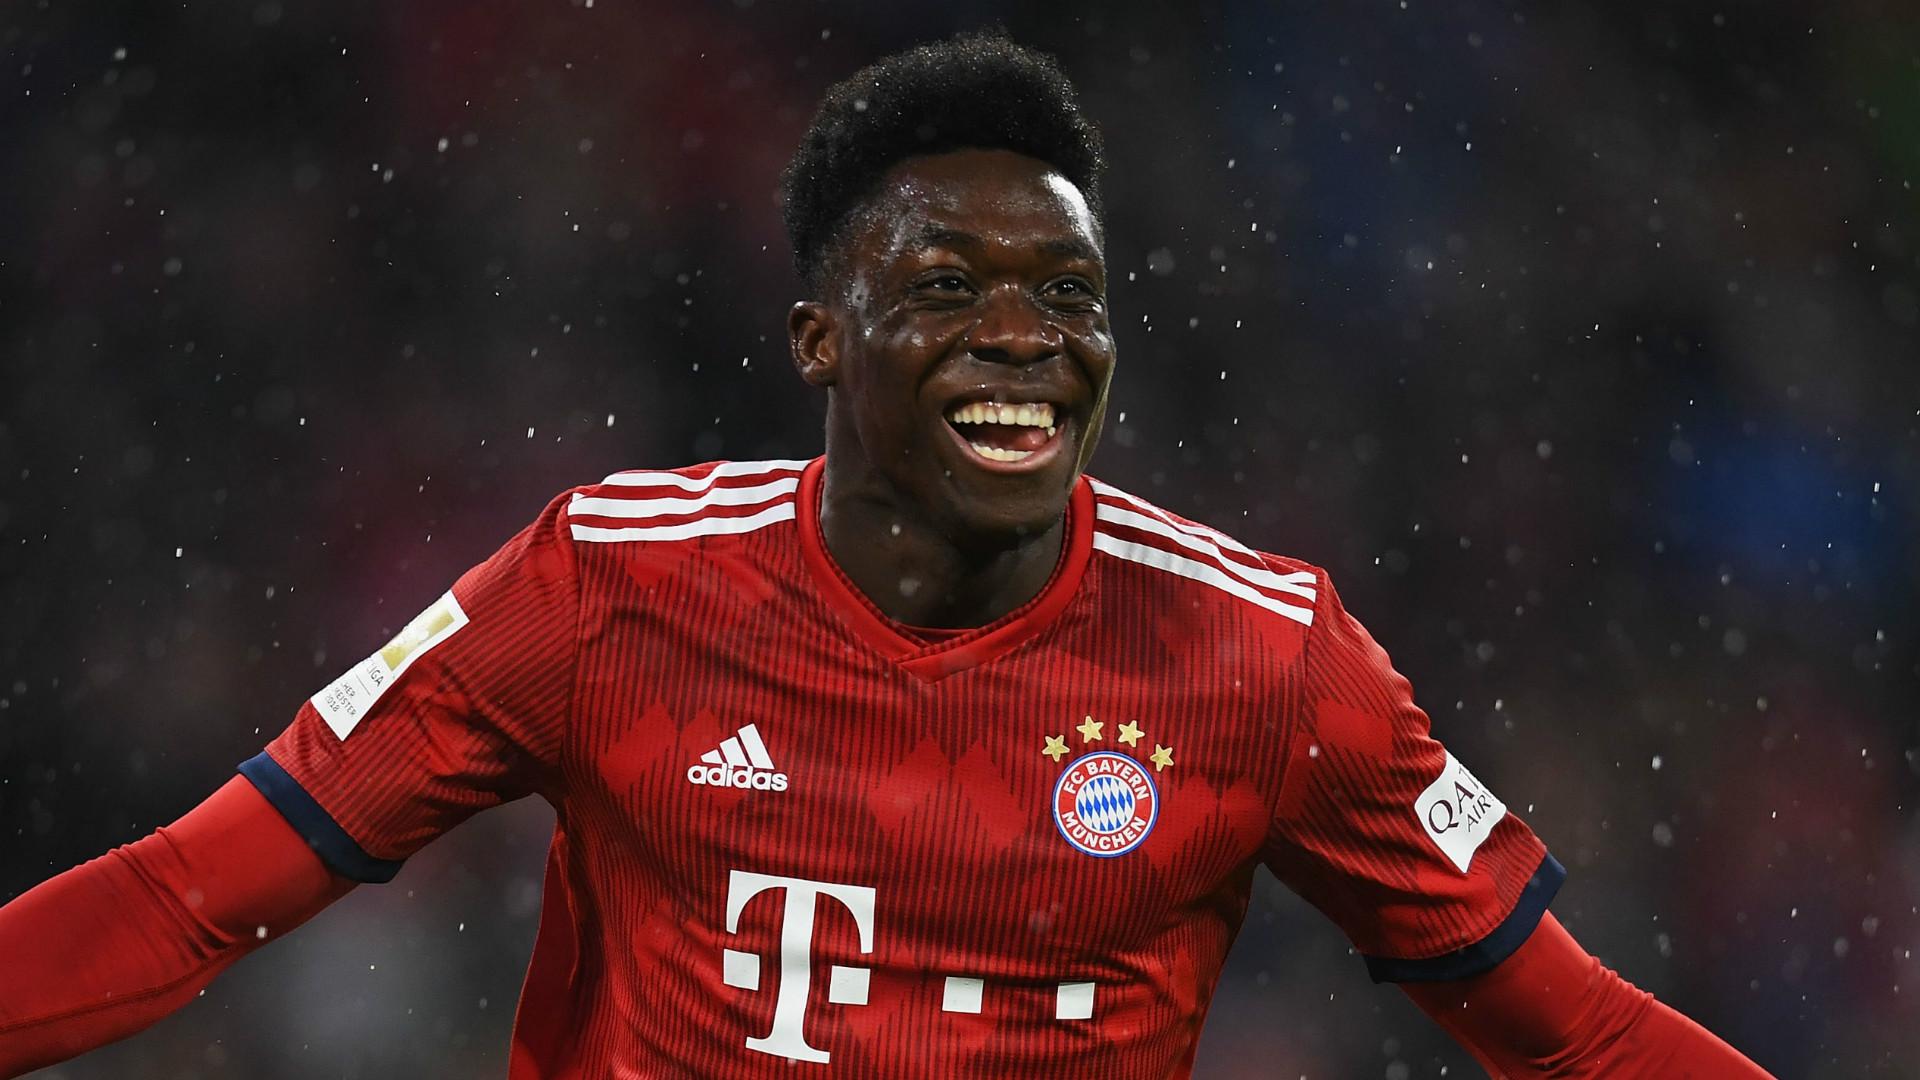 2018 Golf R Usa >> Bayern Munich transfer news: Alphonso Davies not fearing interest in Man City winger Leroy Sane ...